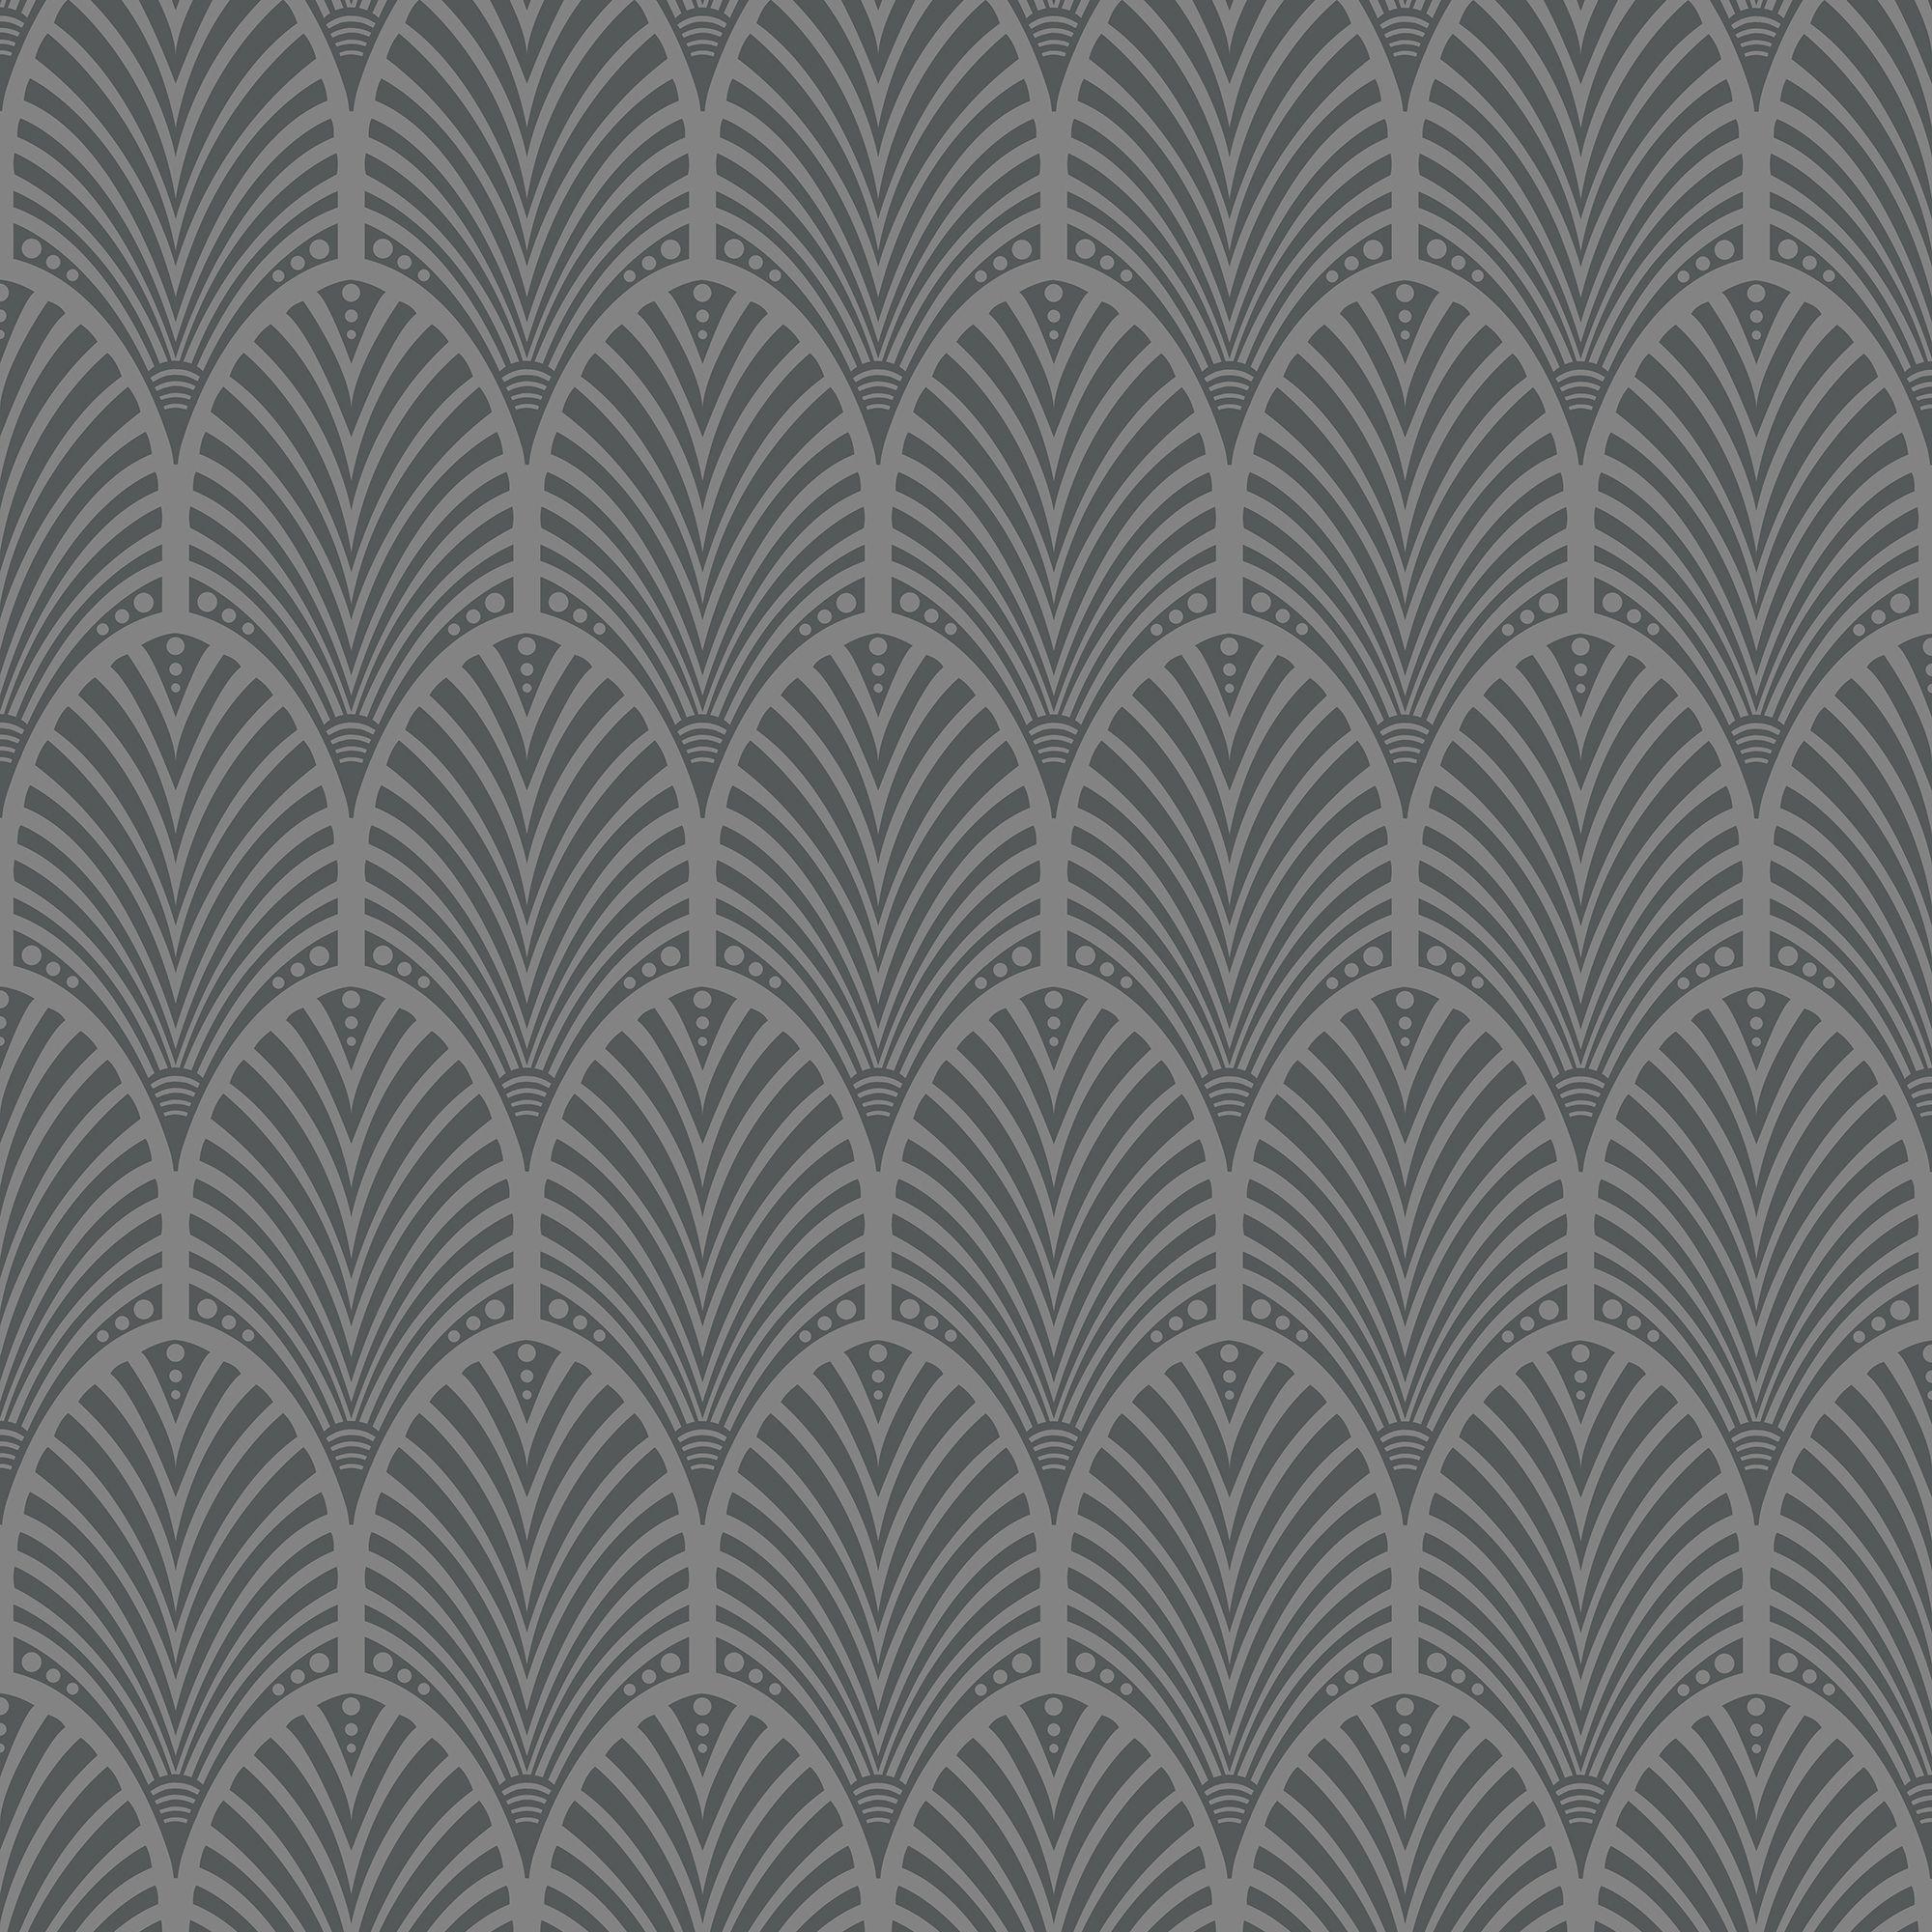 Diy at b q for Grey patterned wallpaper